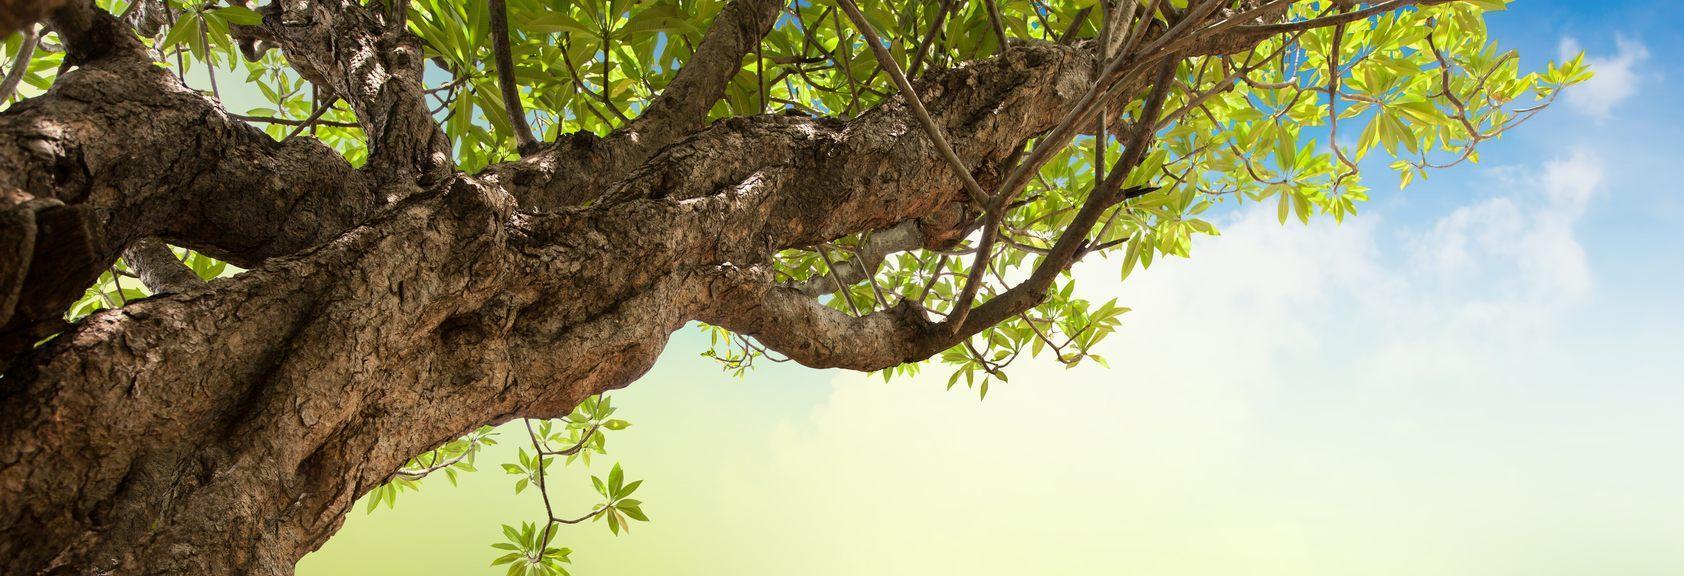 Ron's Stump Removal & Tree Service, LLC main banner image - Tenino, WA